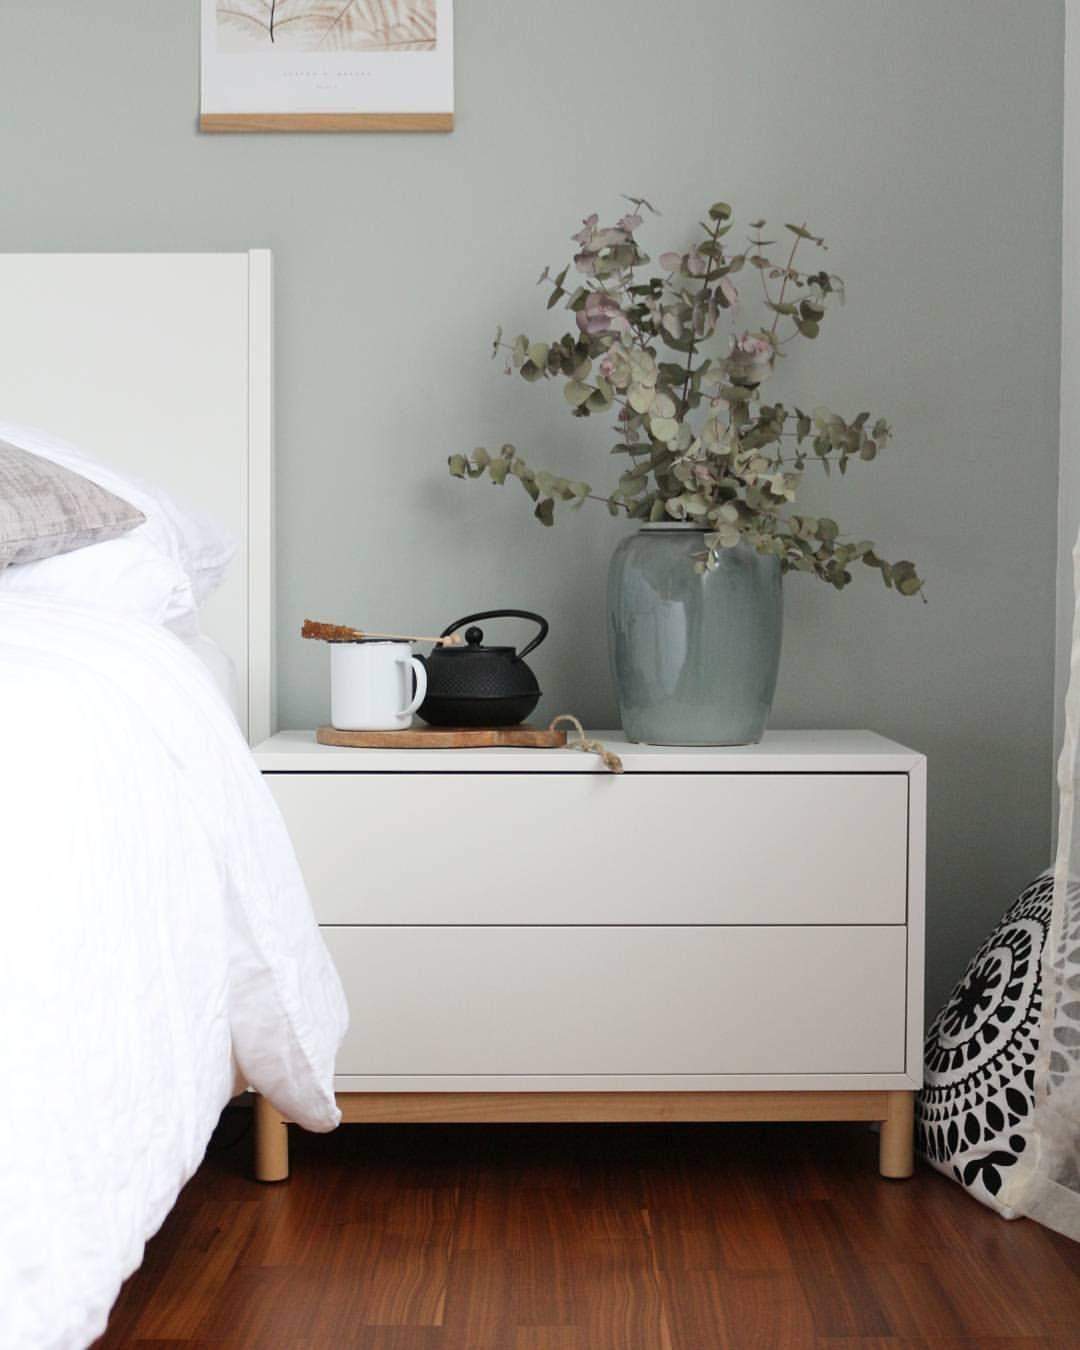 ikea eket nightstand decoracion pinterest. Black Bedroom Furniture Sets. Home Design Ideas